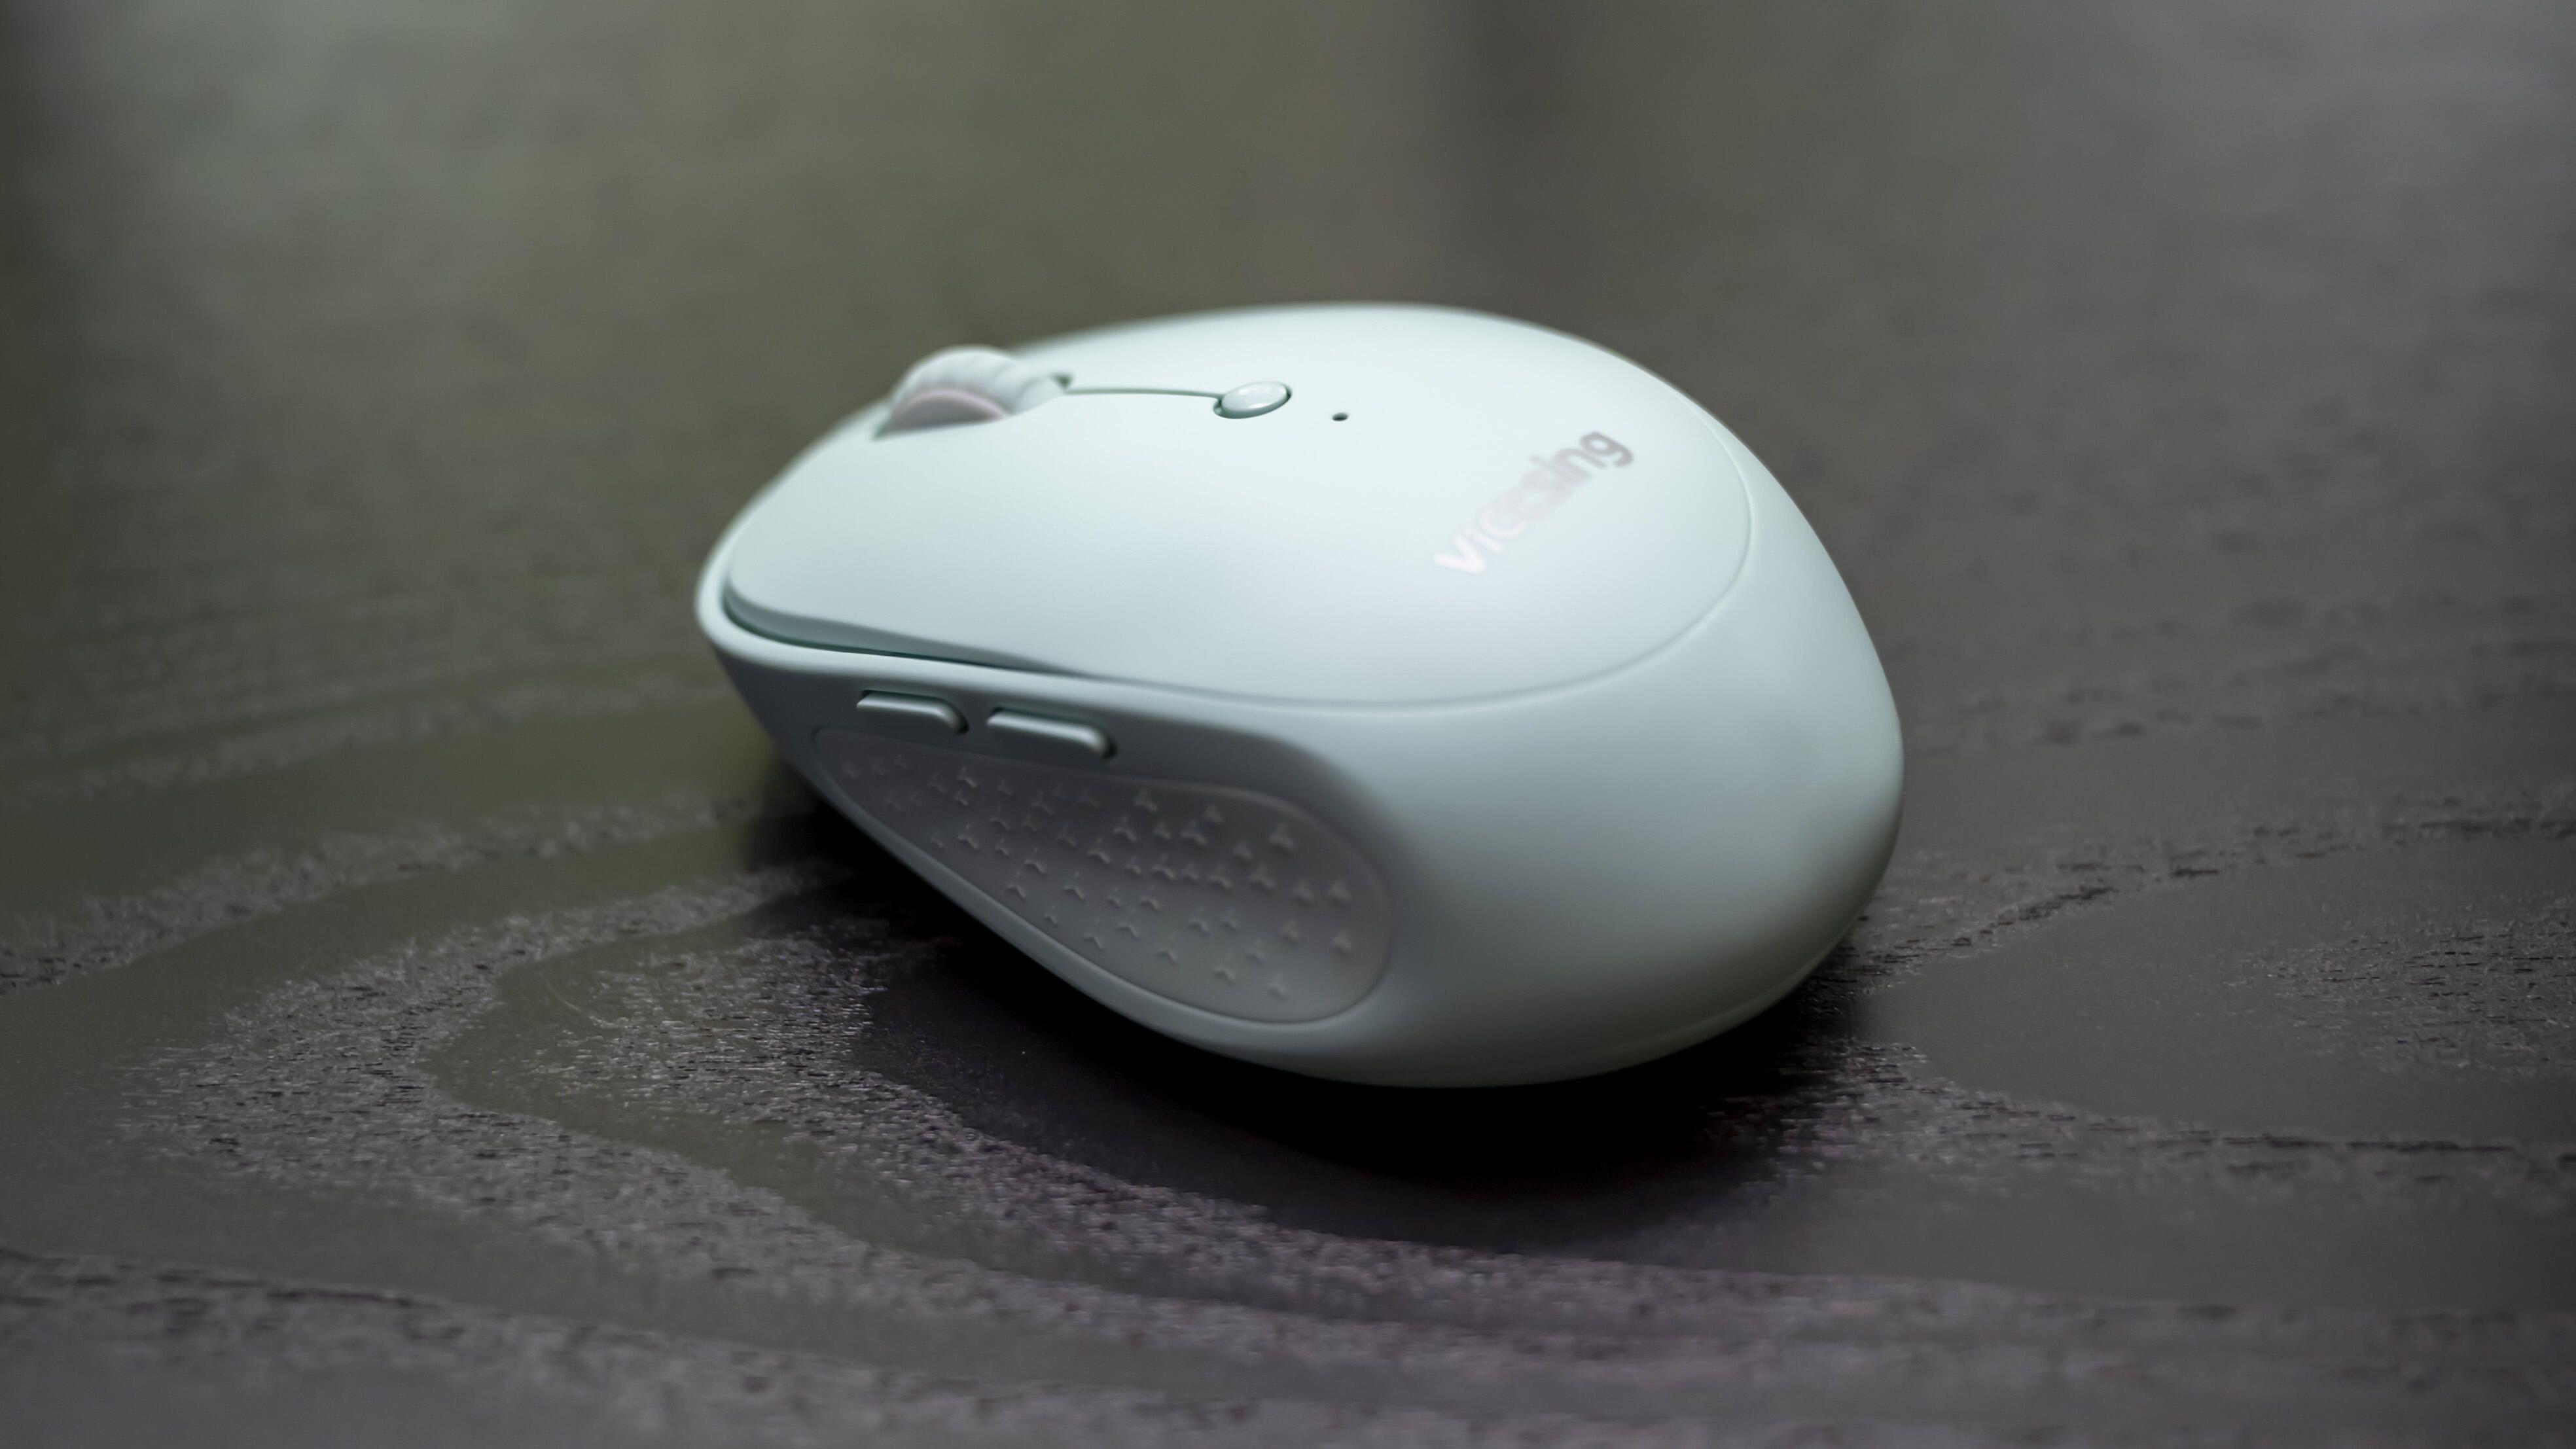 victsing-mini-bluetooth-mouse